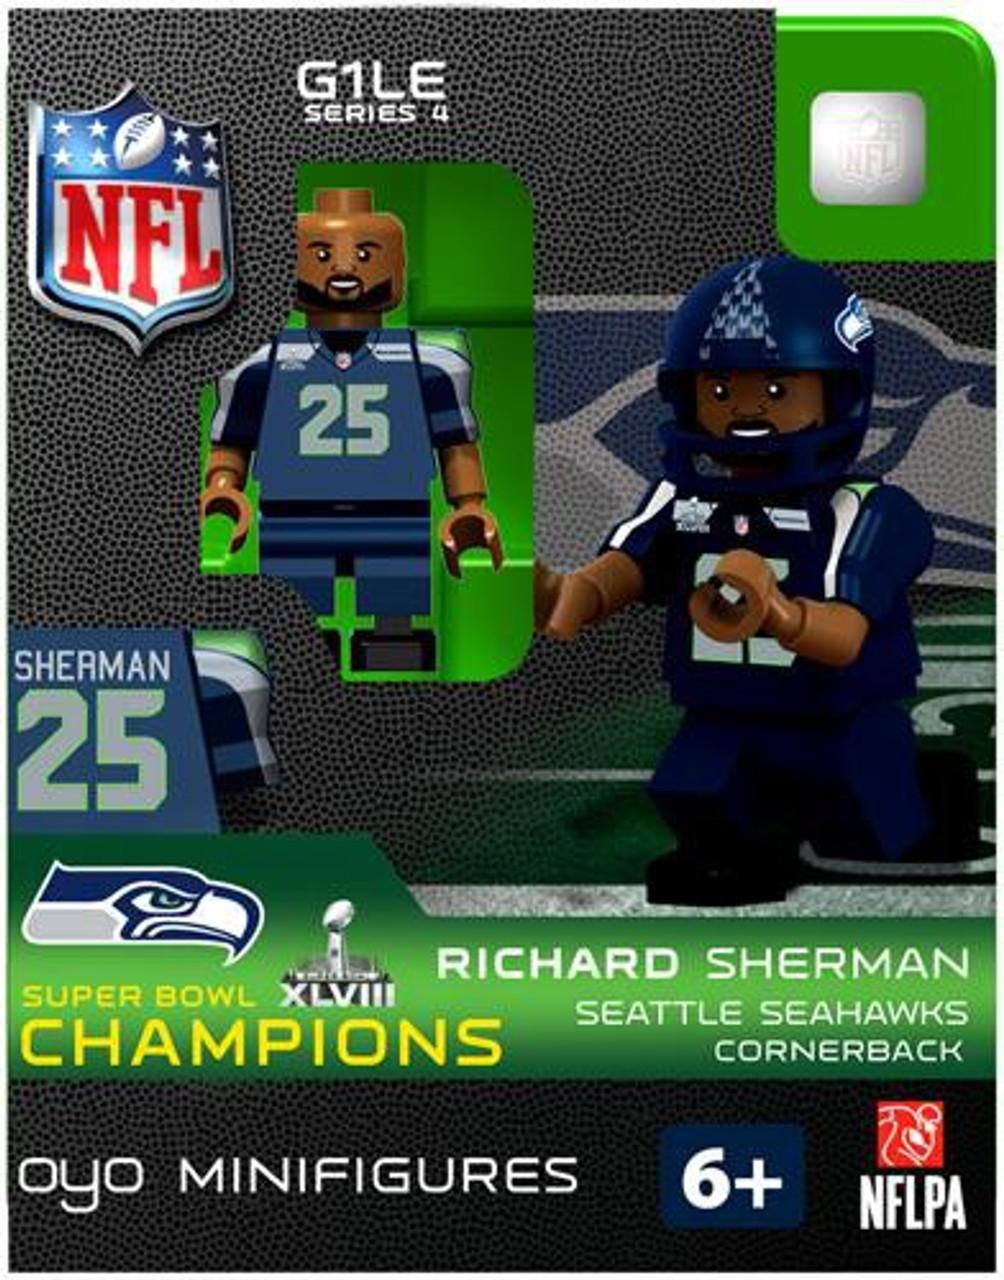 Seattle Seahawks NFL Super Bowl XLVIII Champions Richard Sherman Minifigure